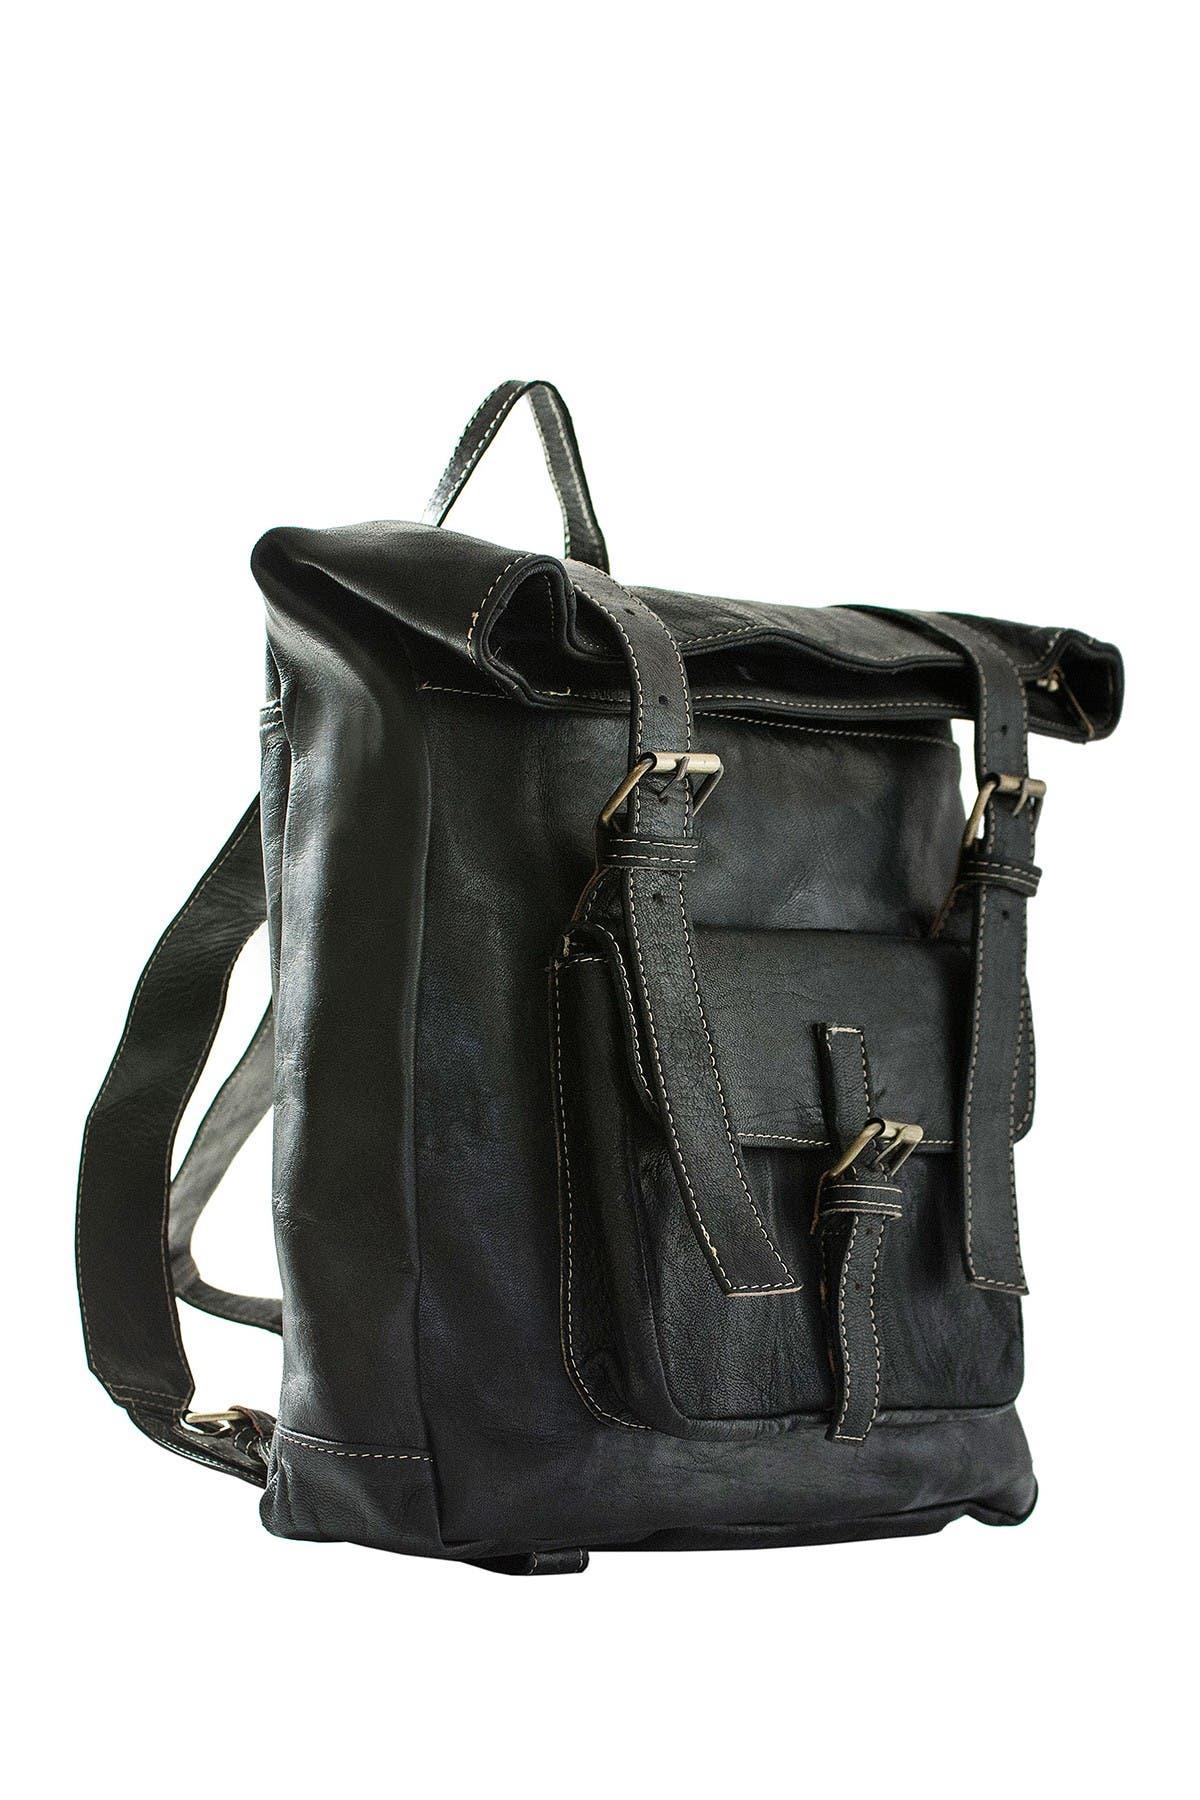 Image of Vintage Addiction Medina Leather Backpack